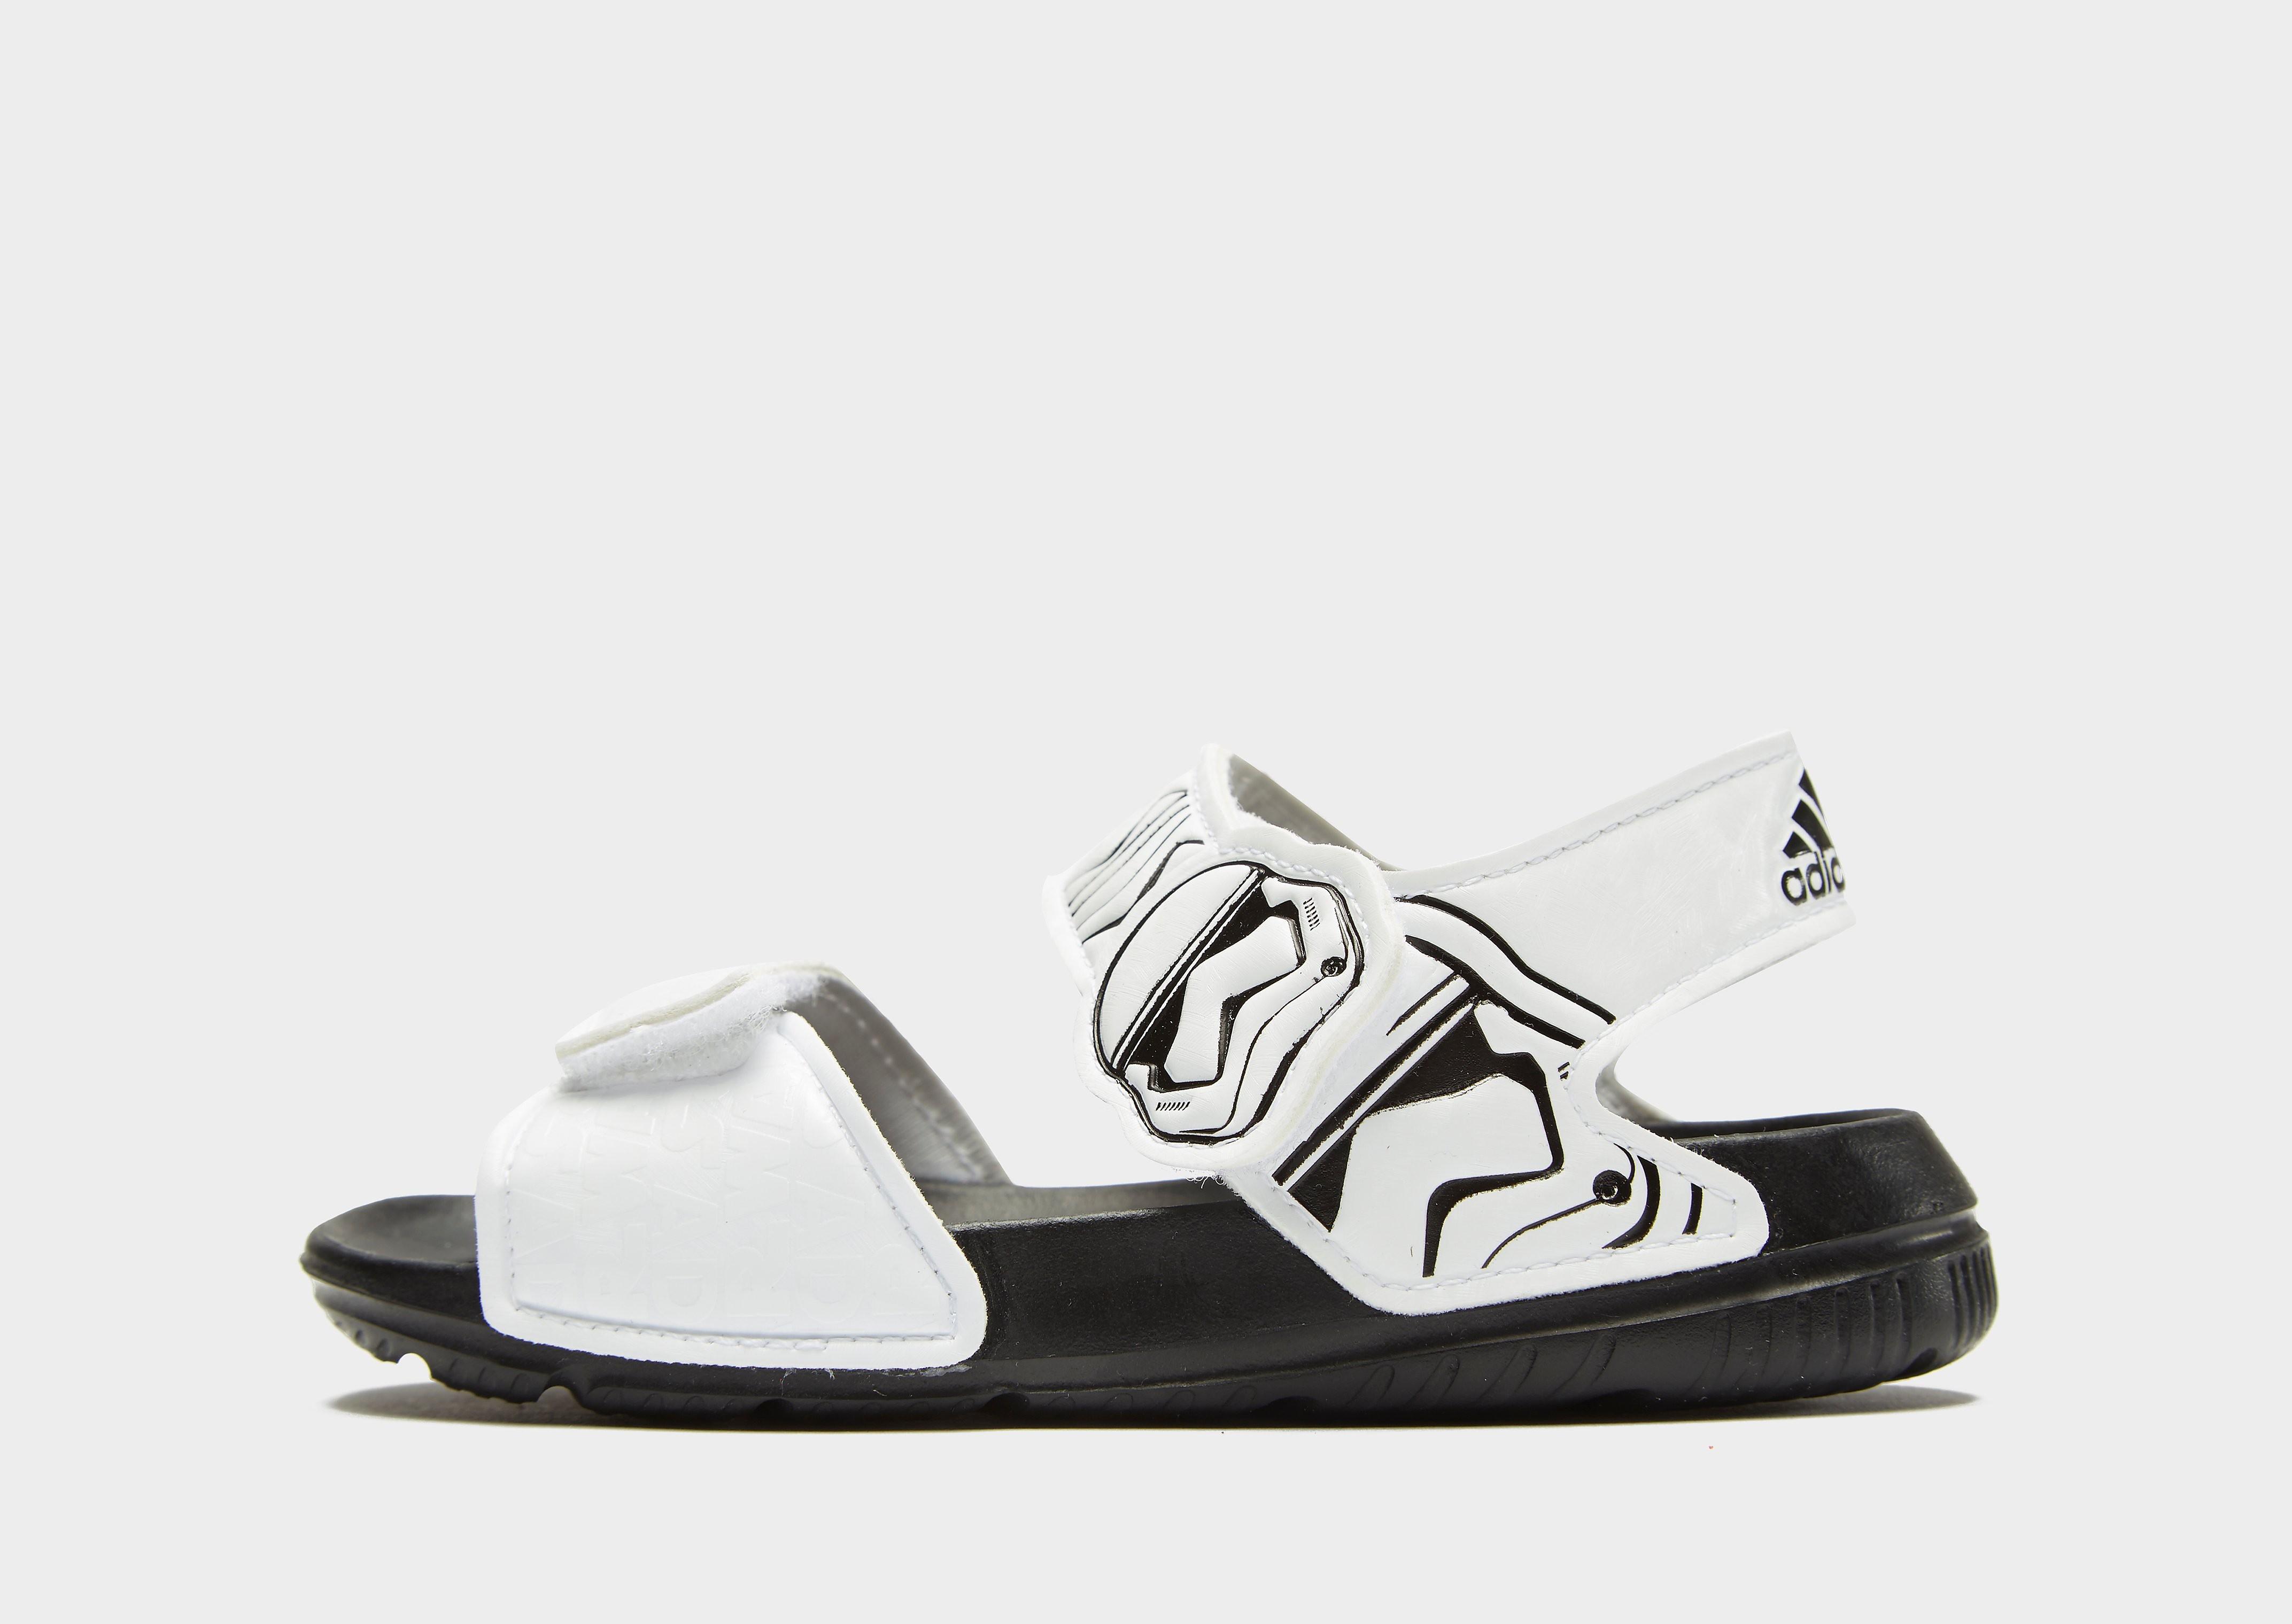 adidas Sandales Star Wars AltaSwim Bébé